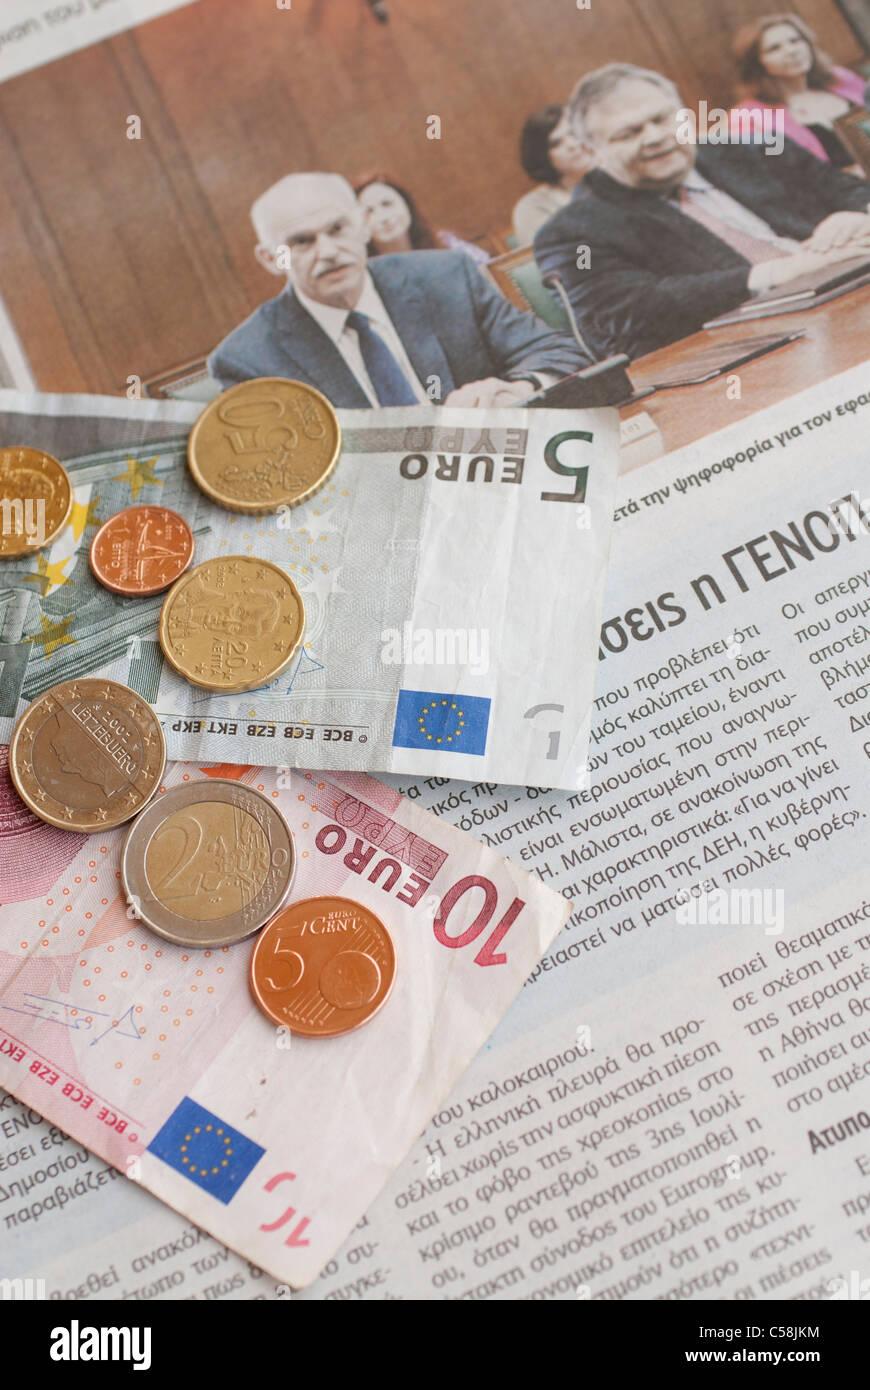 greece,prime,minister,money,crisis,debt,bankruptcy,financial,finance,newspaper,news - Stock Image